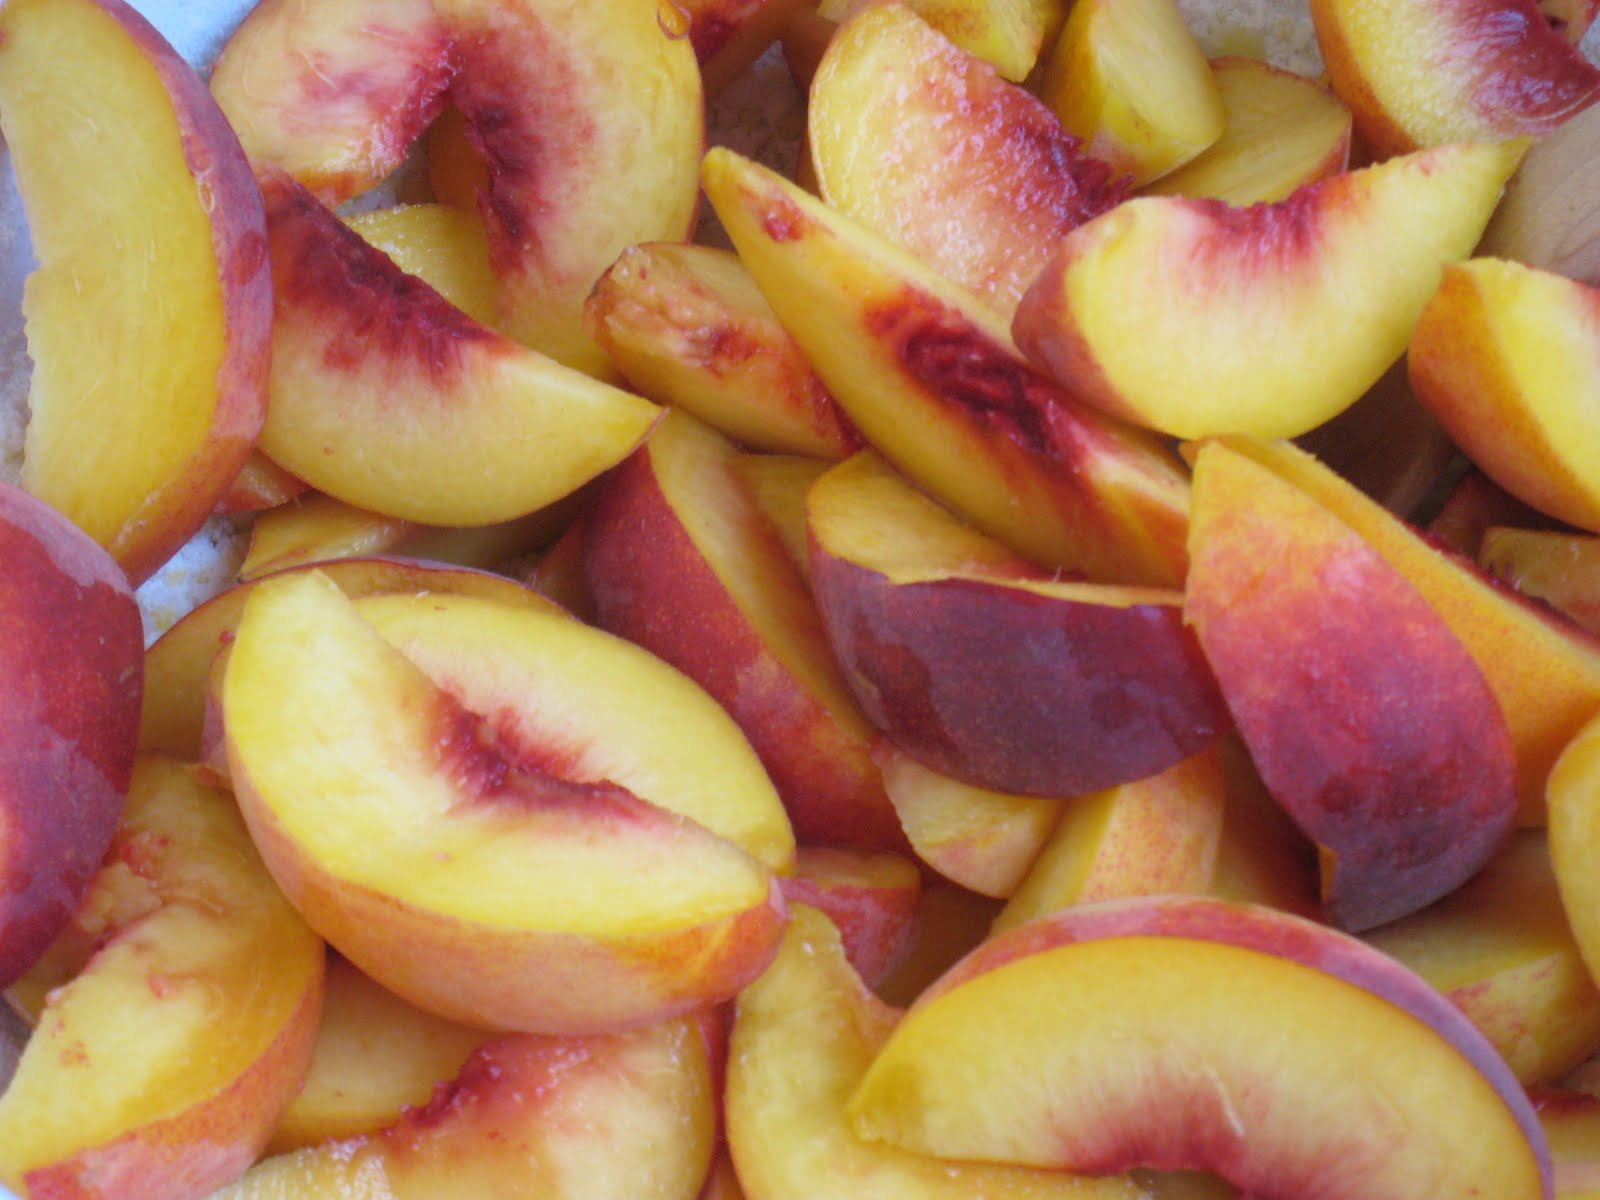 Crown Kabinky: Honey-Glazed Peach Tart with Mascarpone Cream